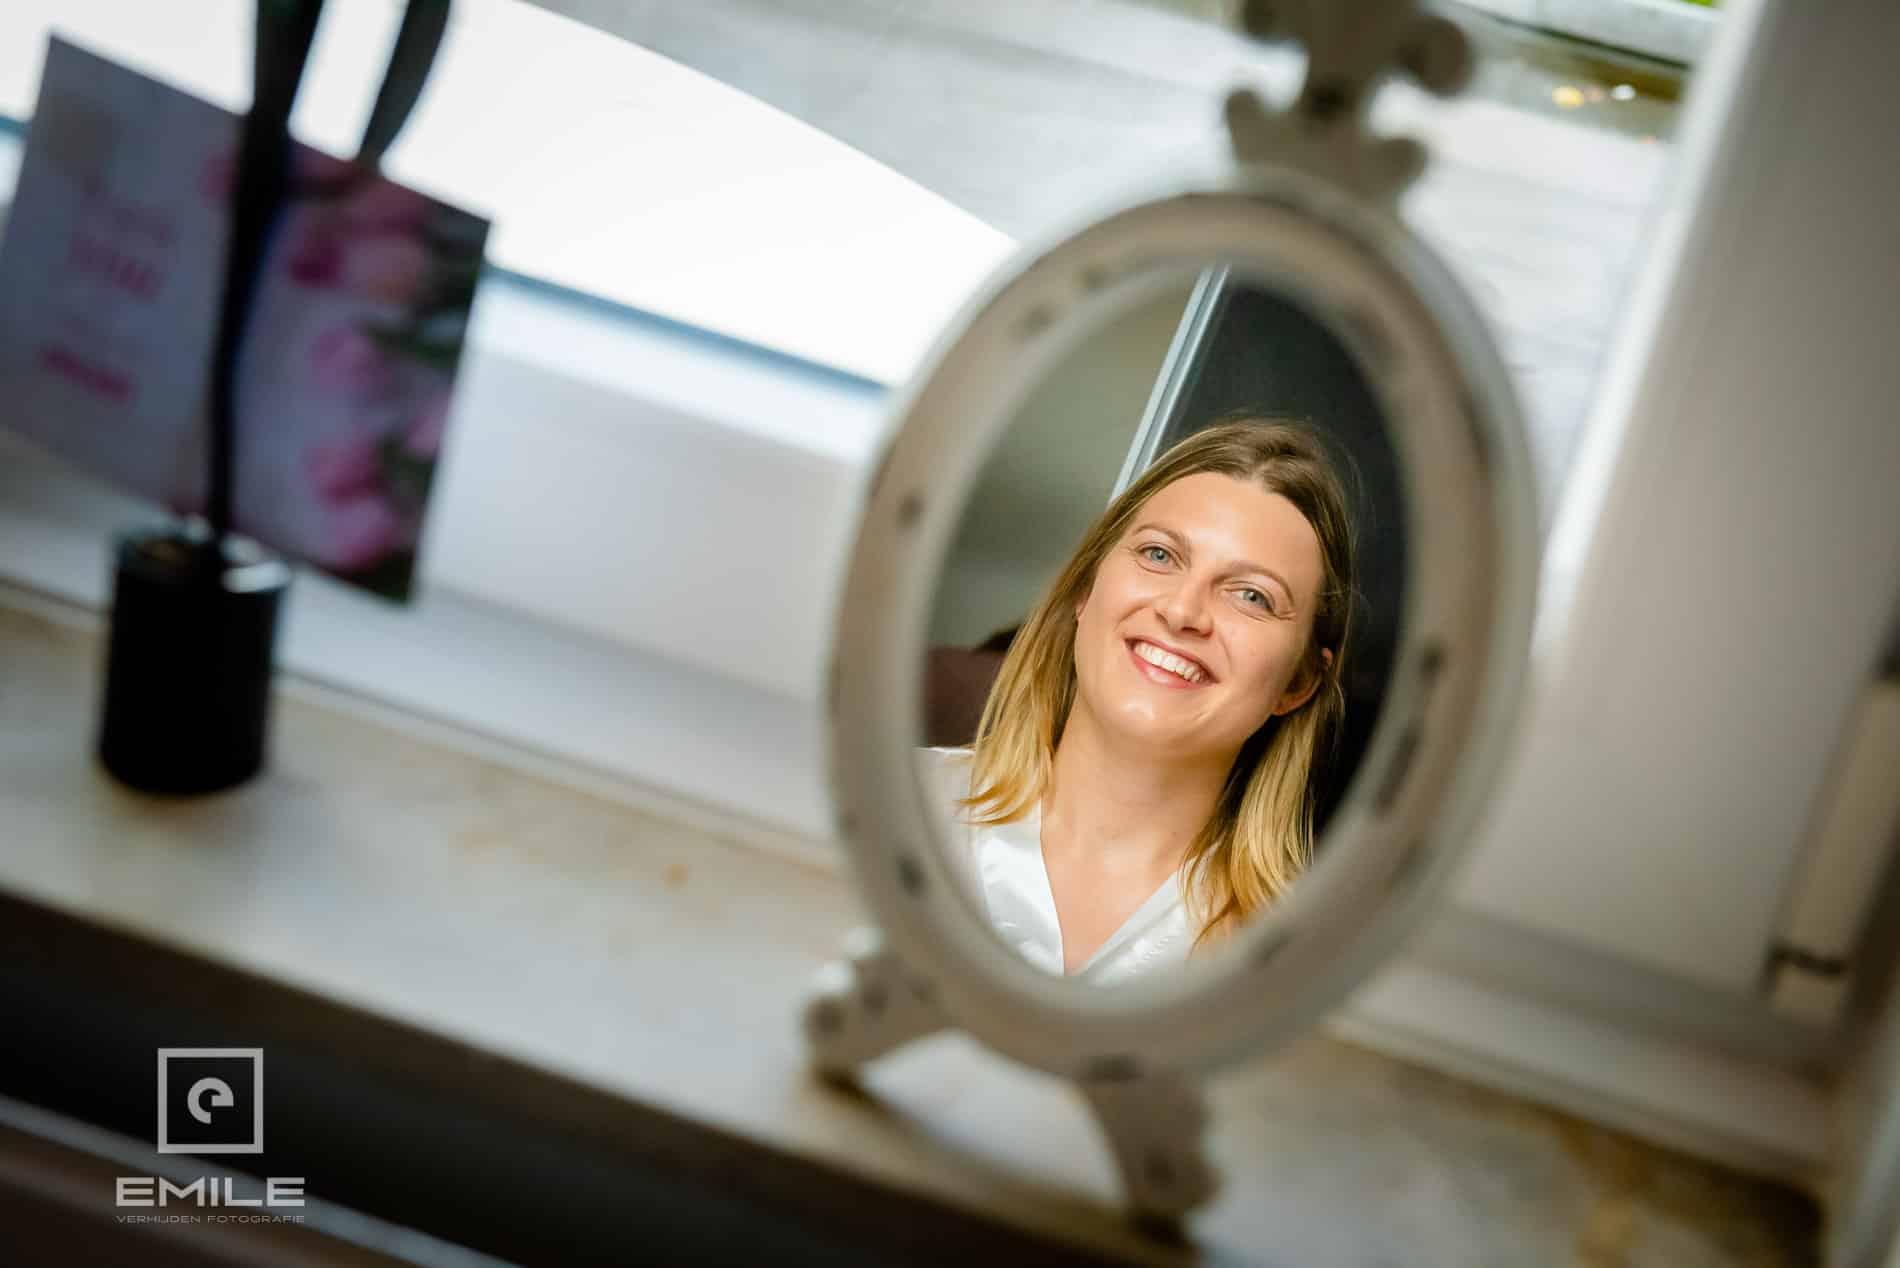 Bruidsfotograaf Kasteel Limbricht Bruid kijkt in spiegel